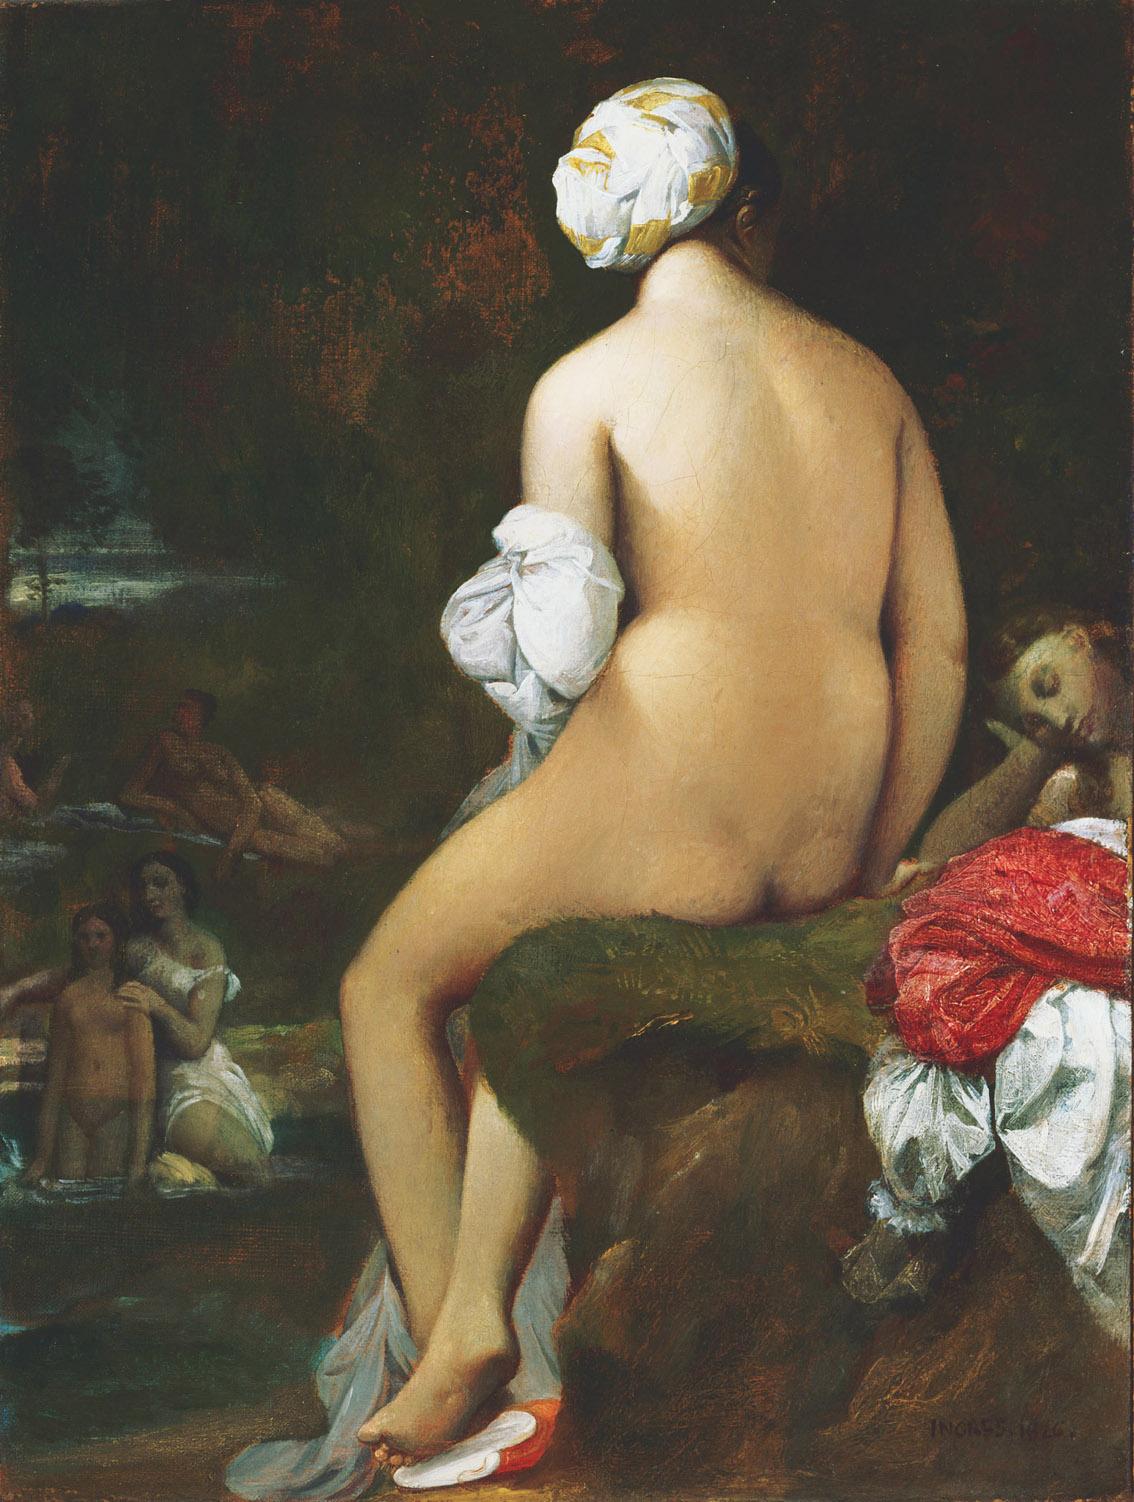 La pequeñabañista, por Jean-Auguste-Dominique Ingres, 1826, óleo sobre lienzo, 32,7 x 25,1 cm, The Phillips Collection, Washington, D.C., adquirido en 1948.